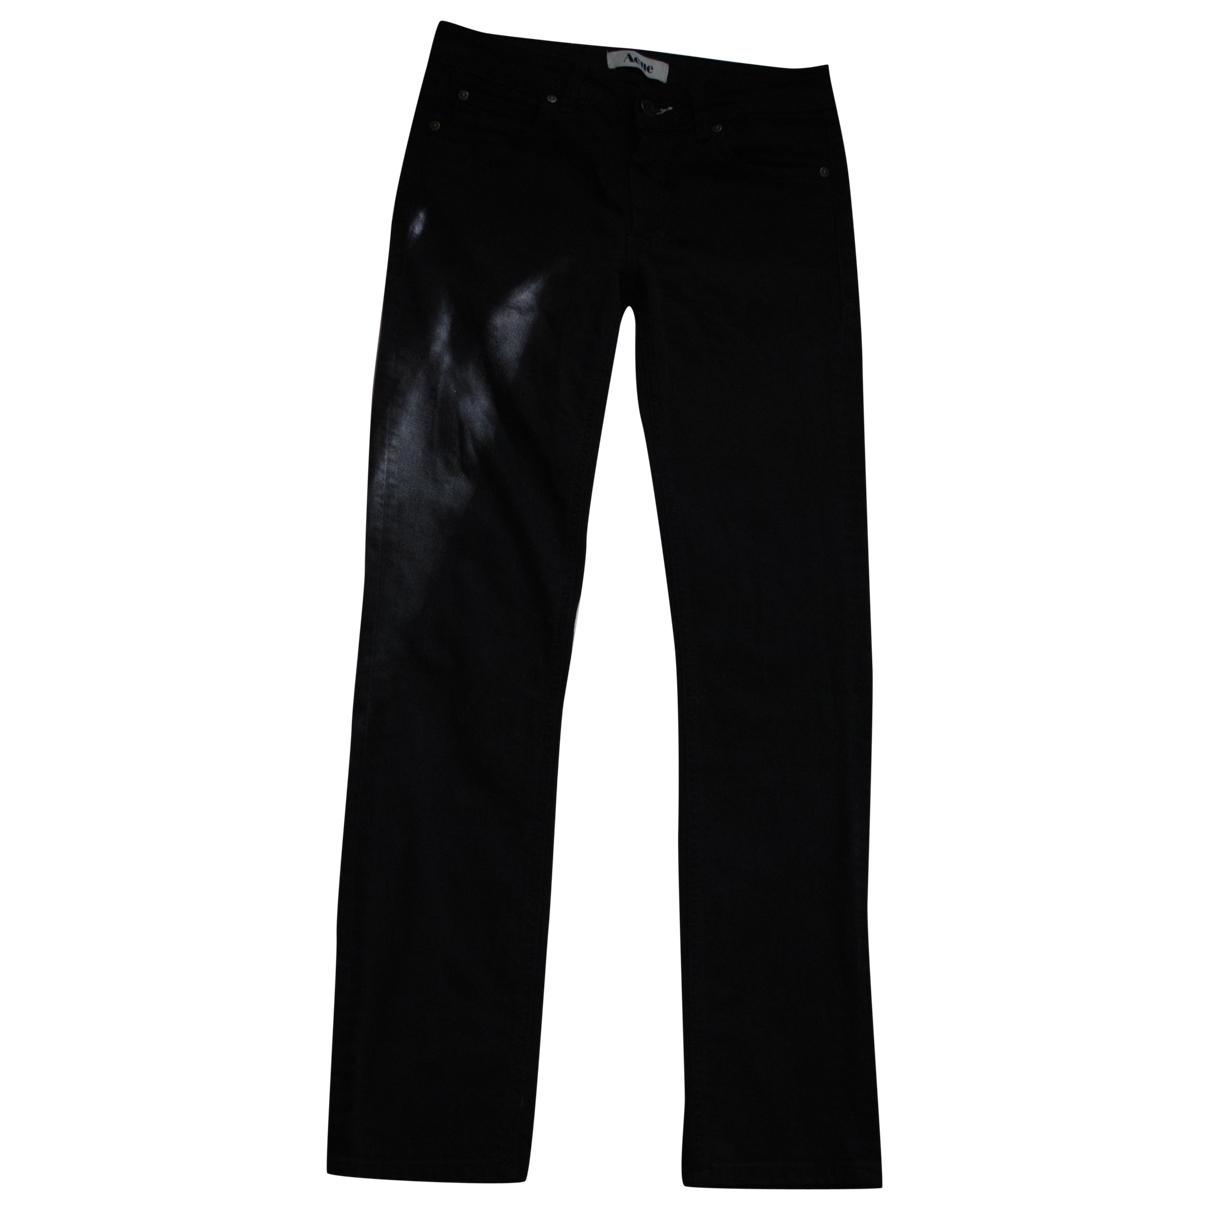 Acne Studios \N Black Cotton - elasthane Jeans for Women 28 US